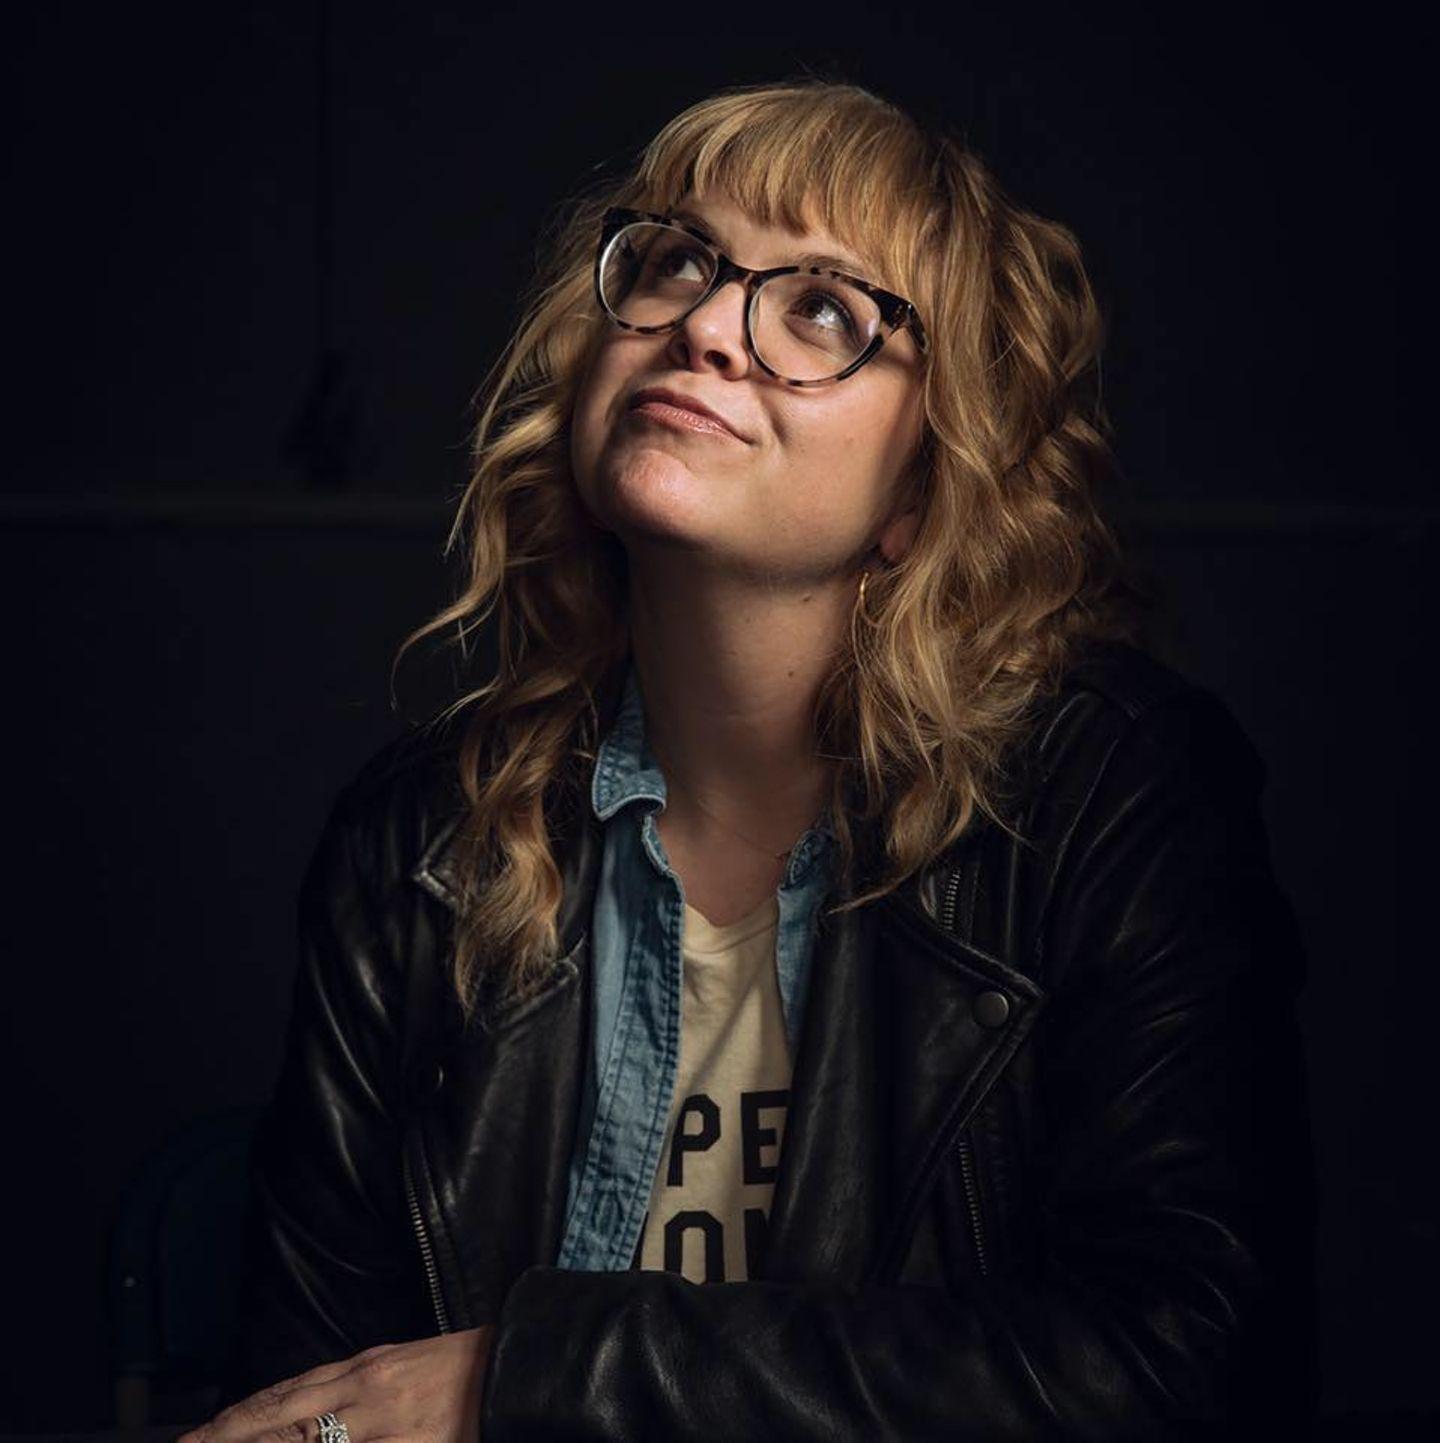 Quinn Katherman